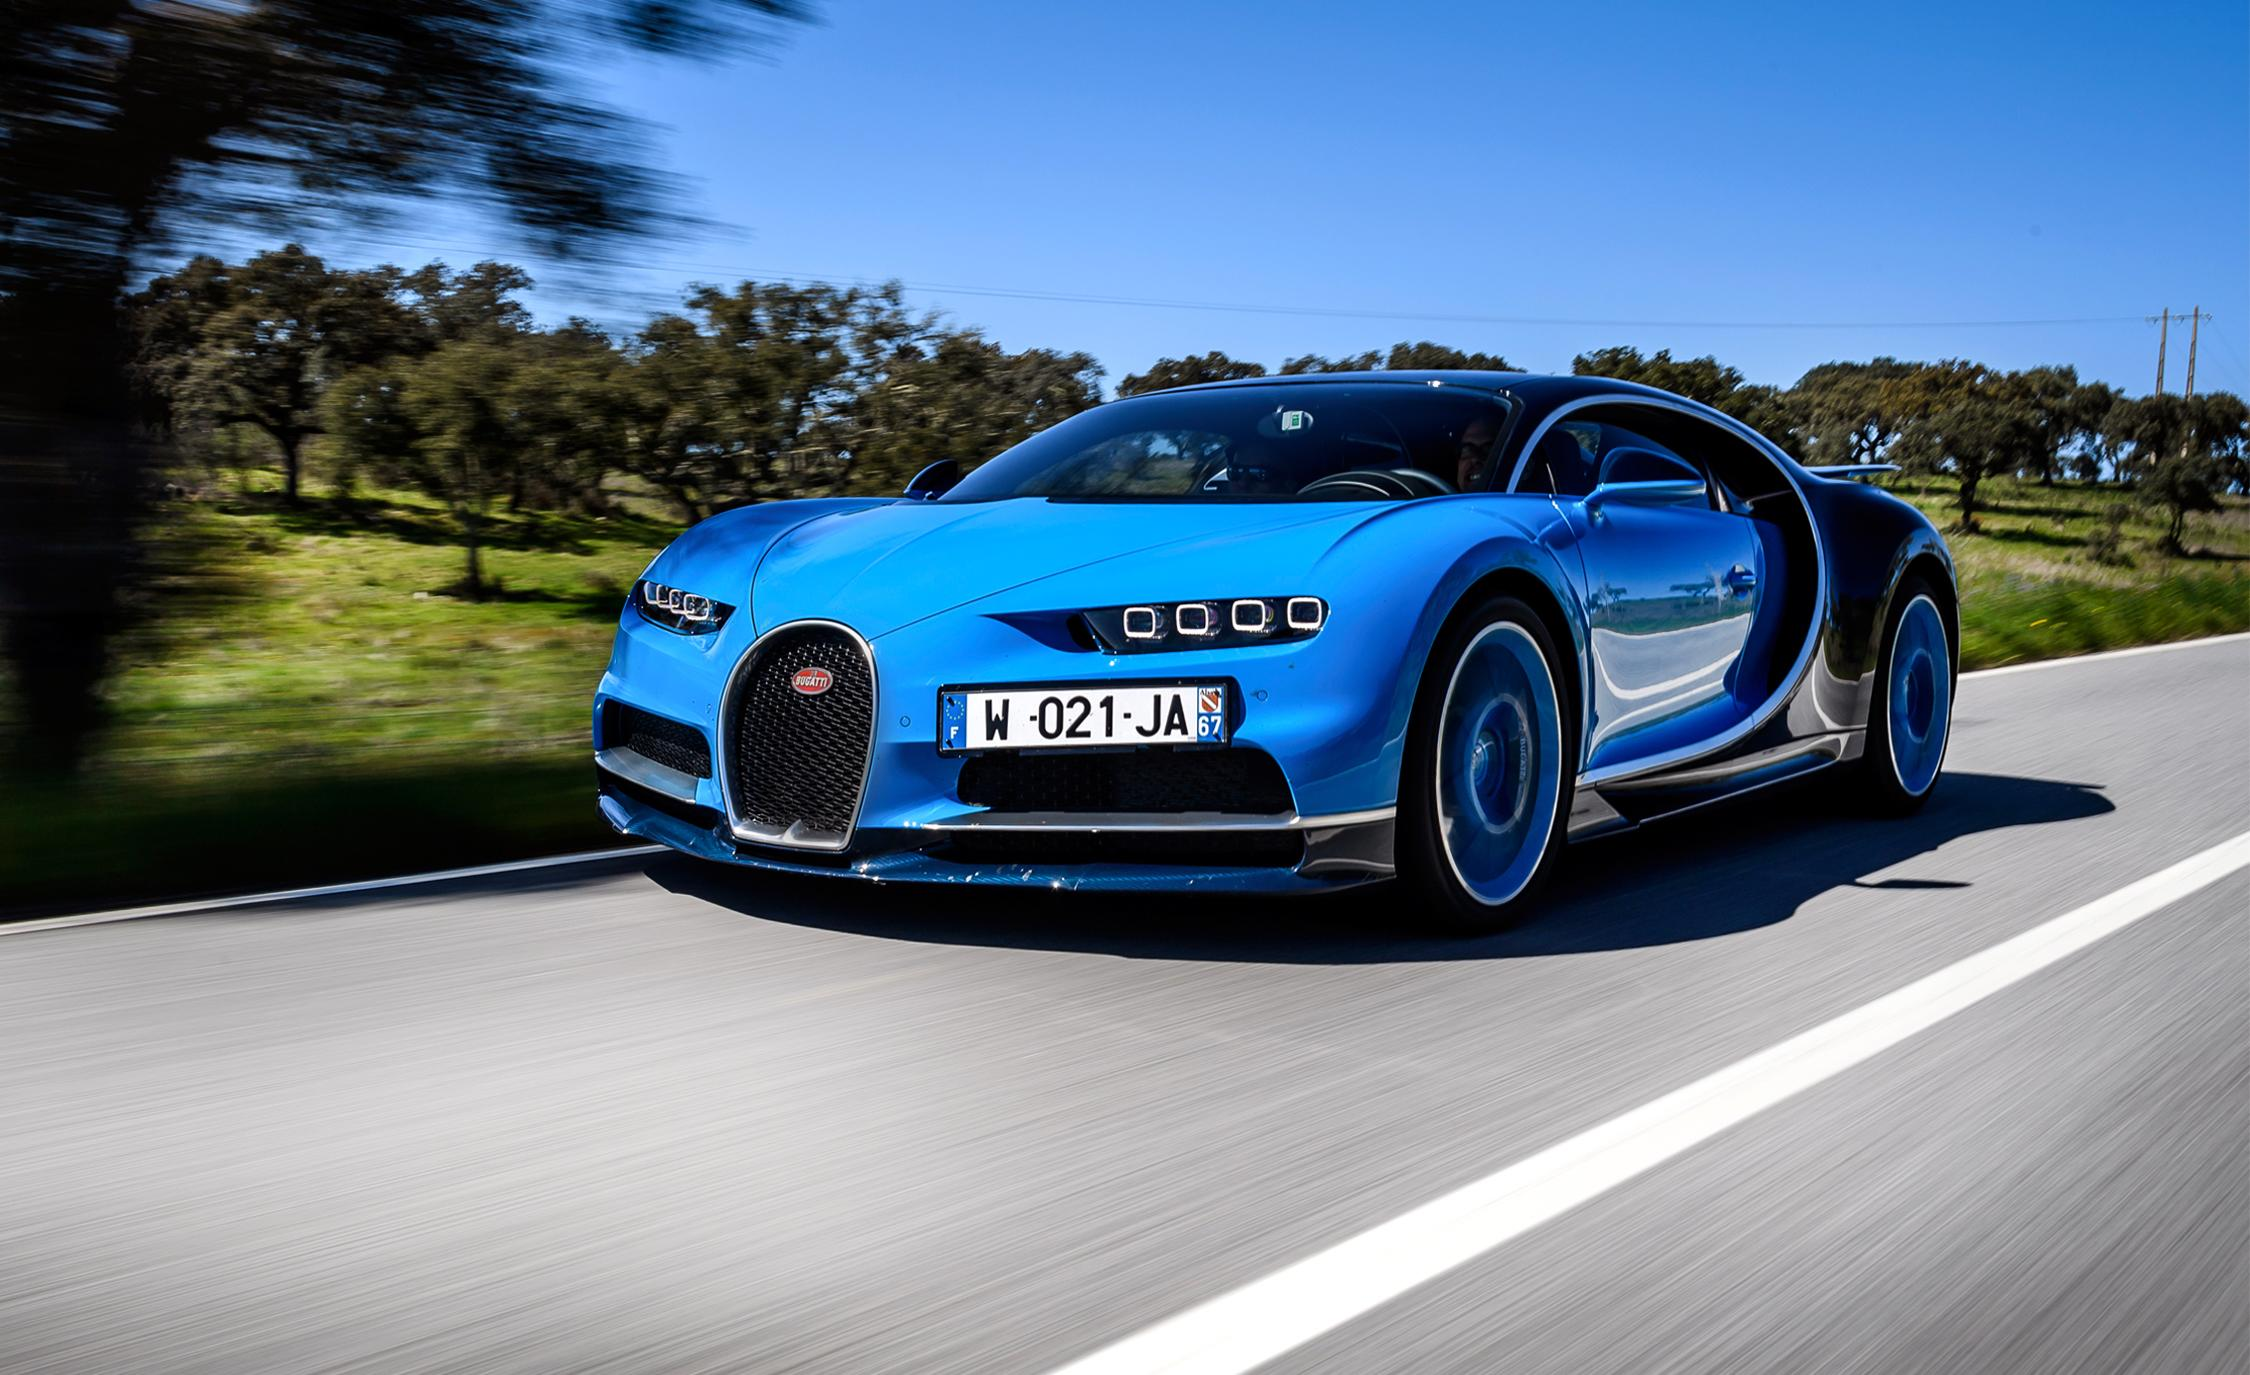 8a1e31babdbdfb6ef7b38a6d0e59a93d Amazing Bugatti Veyron Price In Egypt Cars Trend